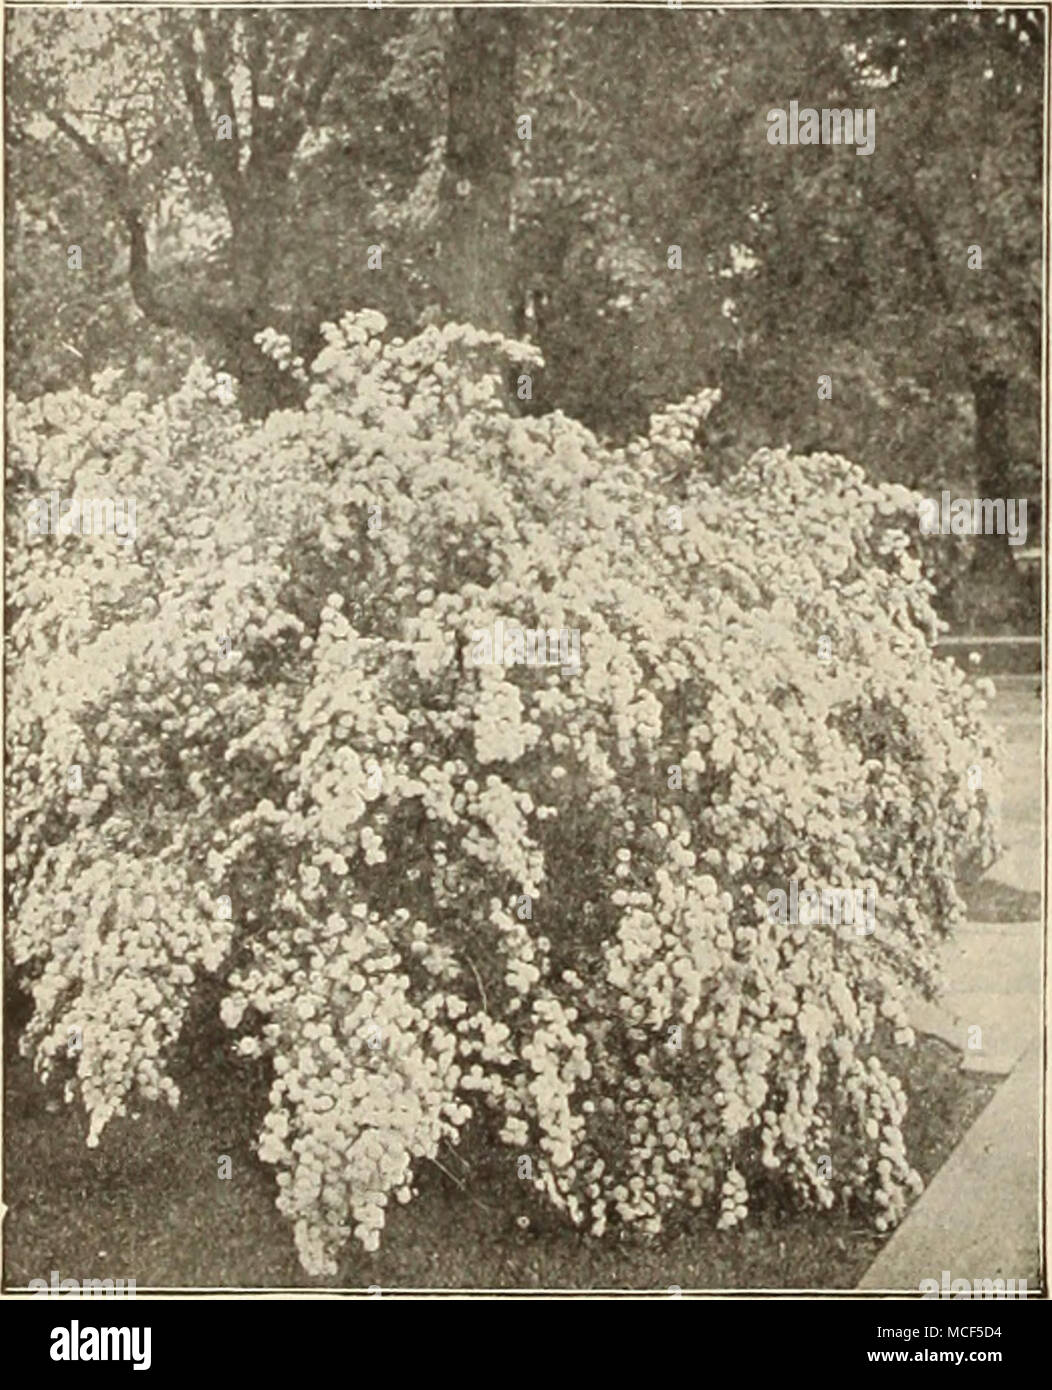 Spira Van Houttei Prunus Japonica Fl Pi Doiiblc Flowcrini